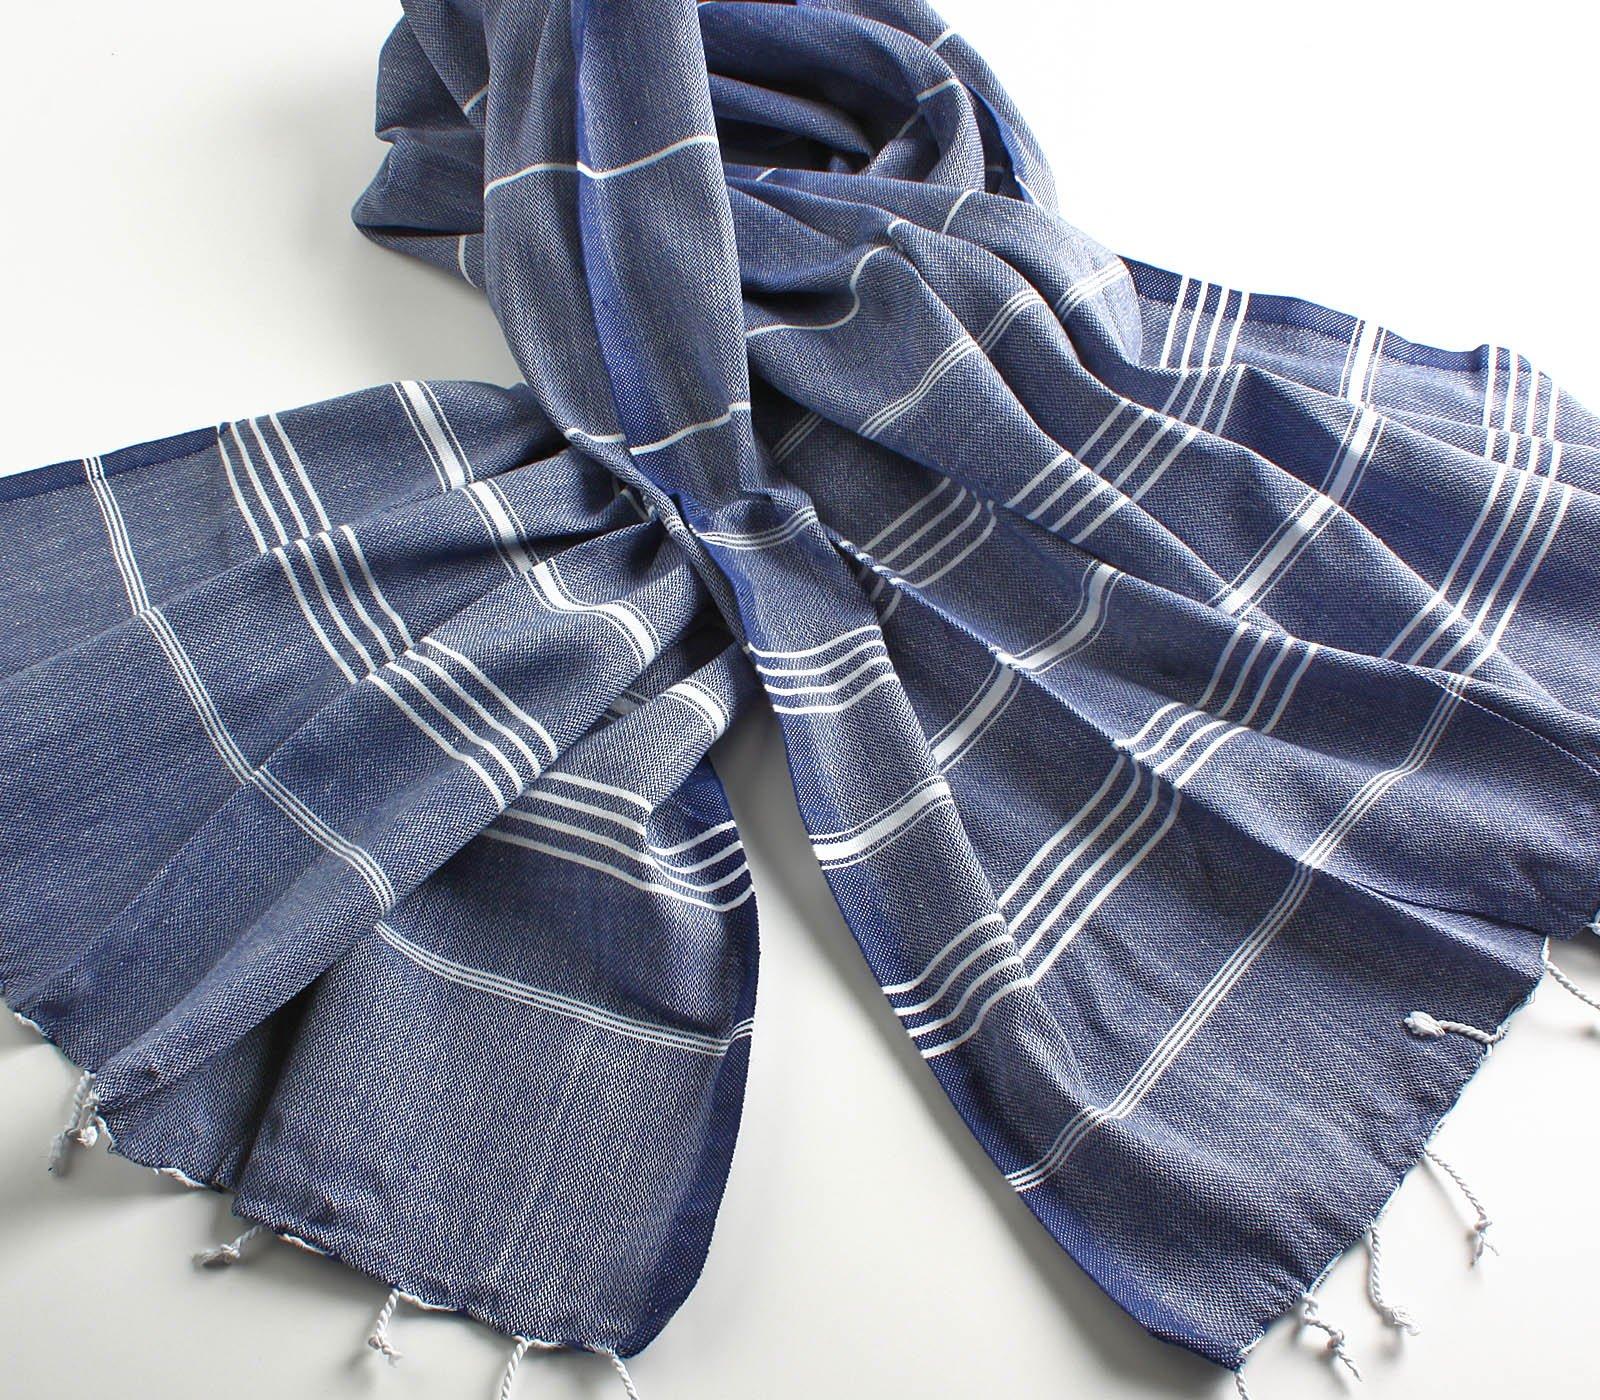 Cacala 100% Cotton Pestemal Turkish Bath Towel, 37 x 70, Dark Blue by Cacala (Image #4)